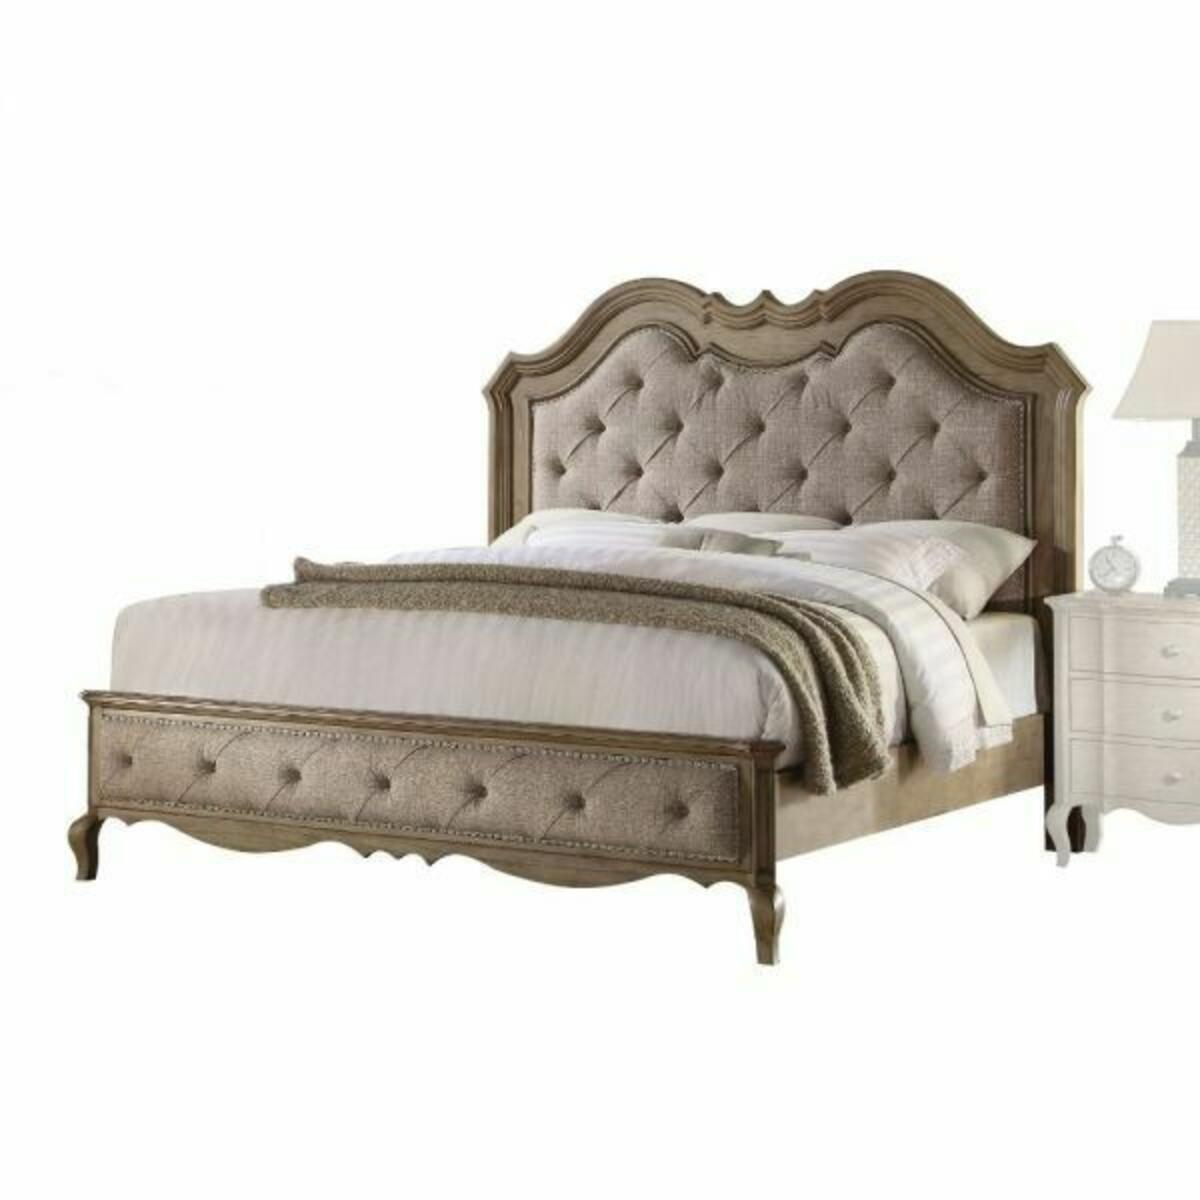 ACME Chelmsford Eastern King Bed - 26047EK - Beige Fabric & Antique Taupe